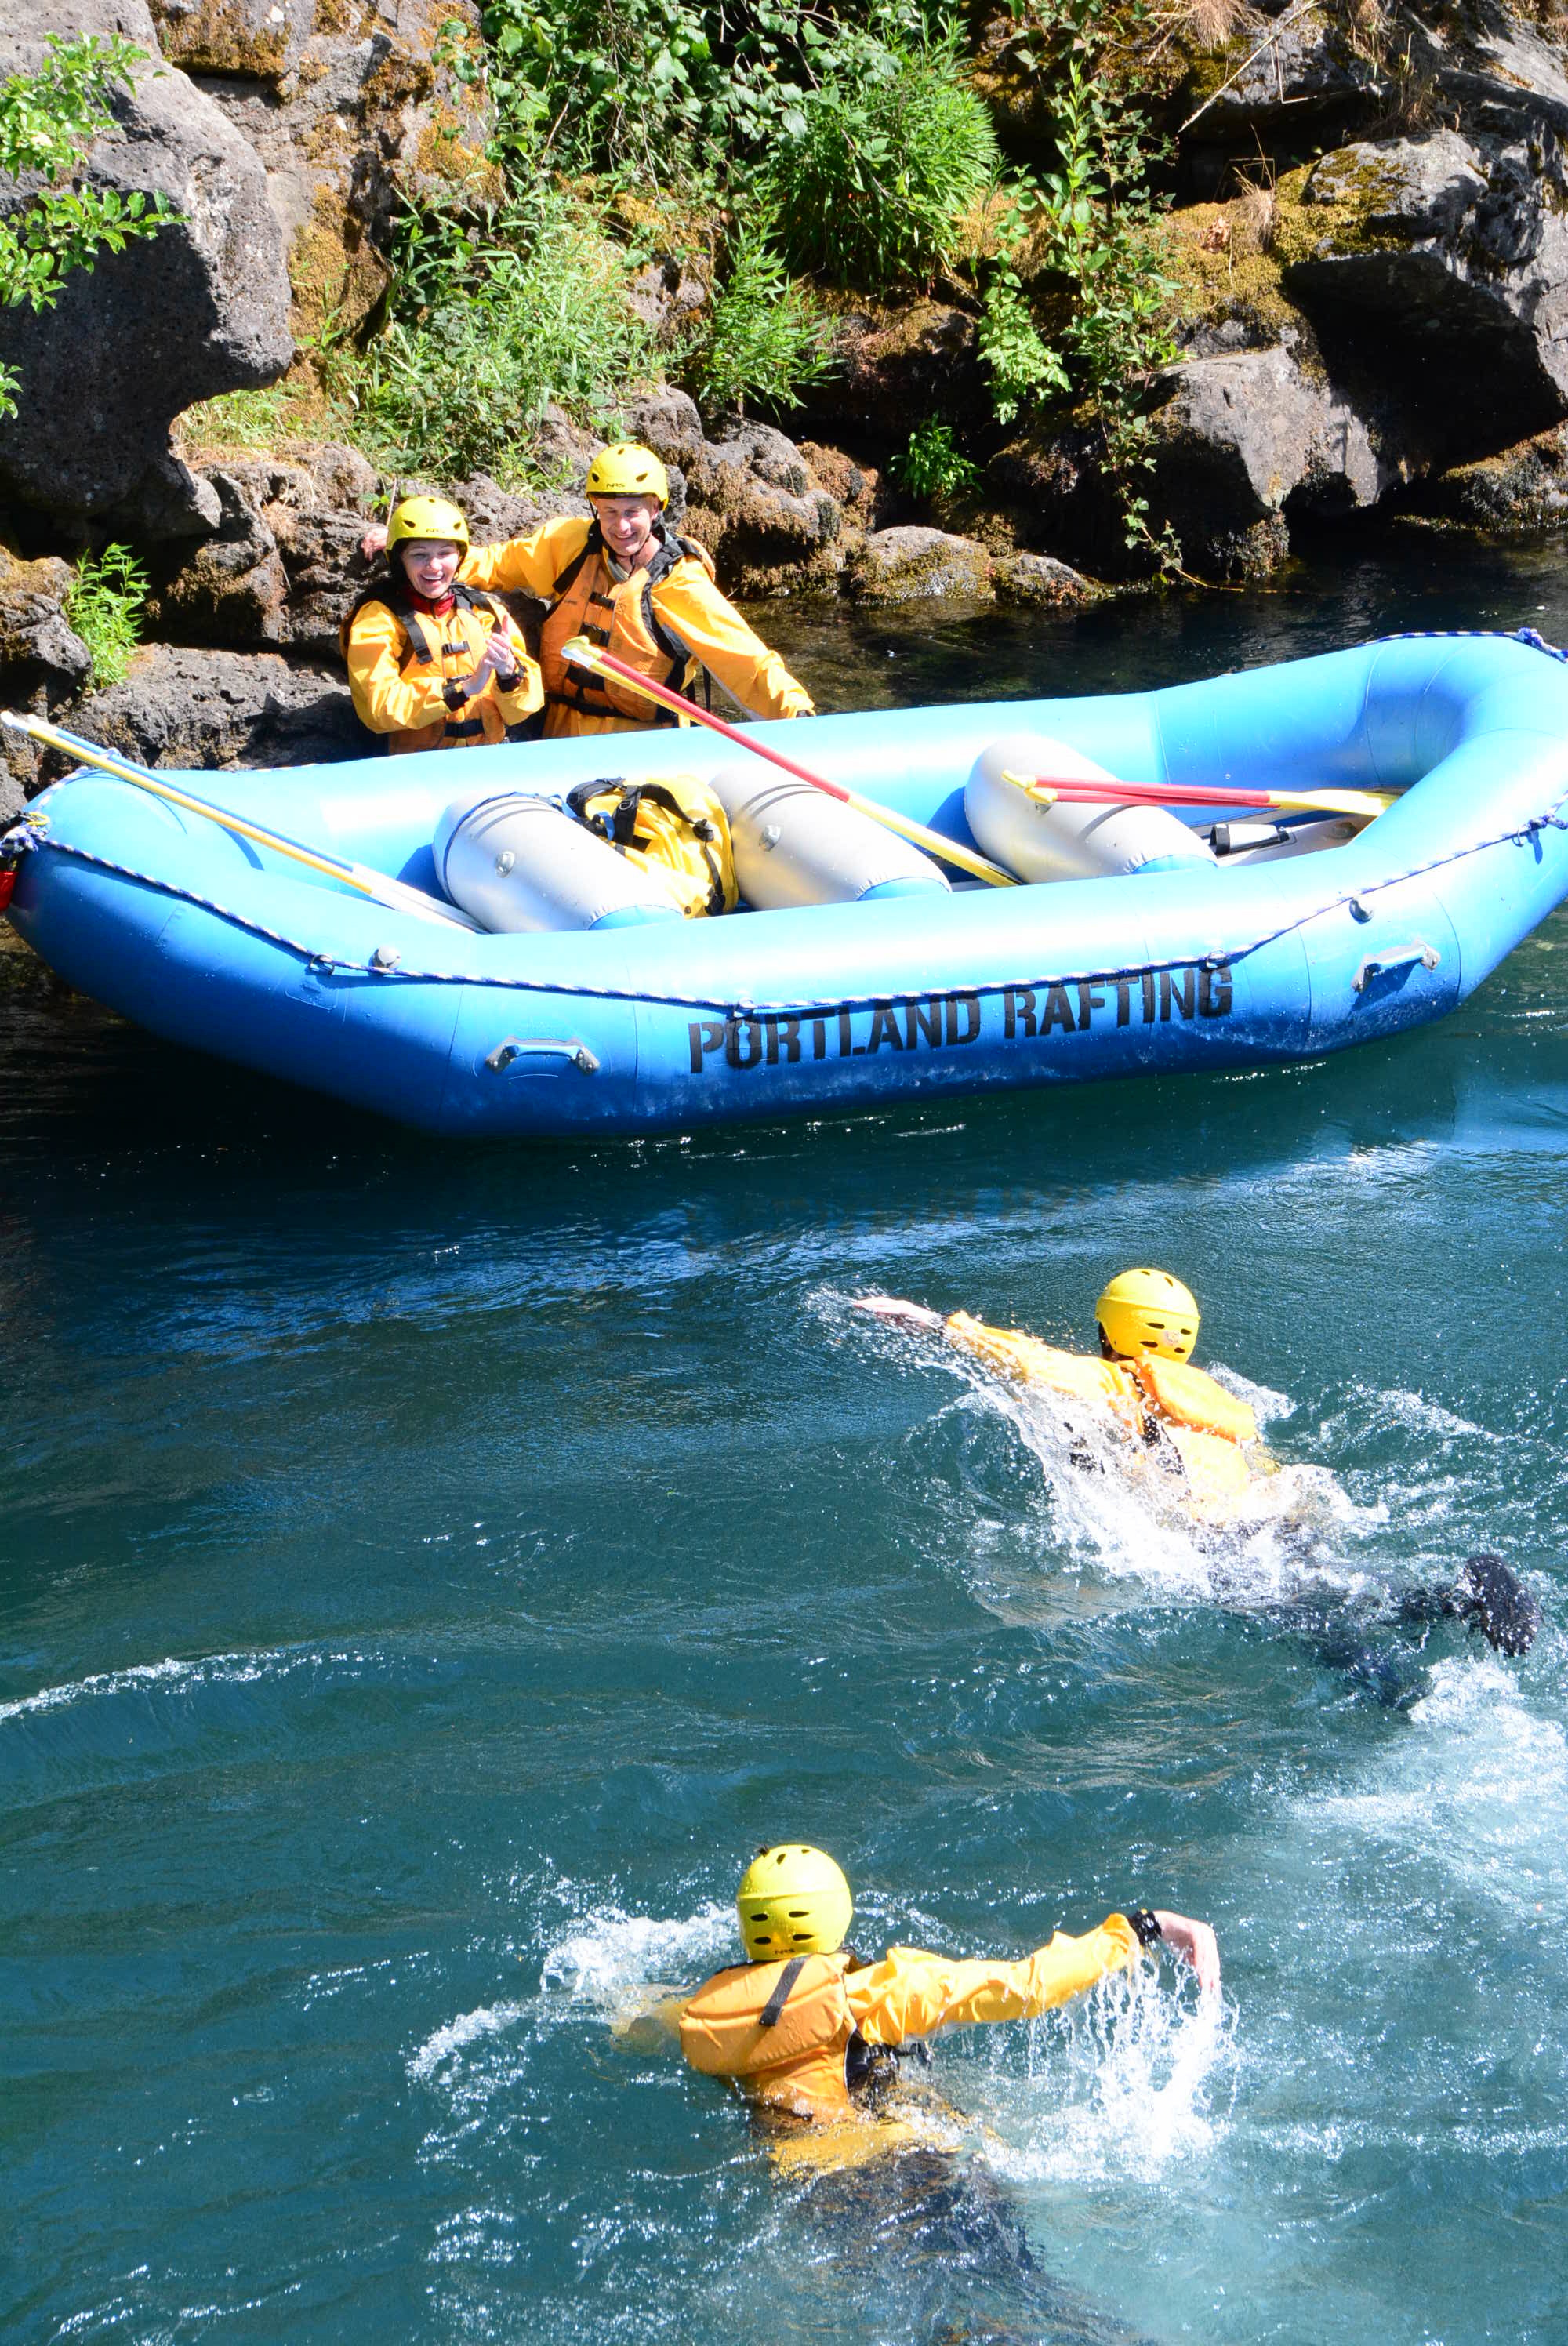 River fun for everyone!